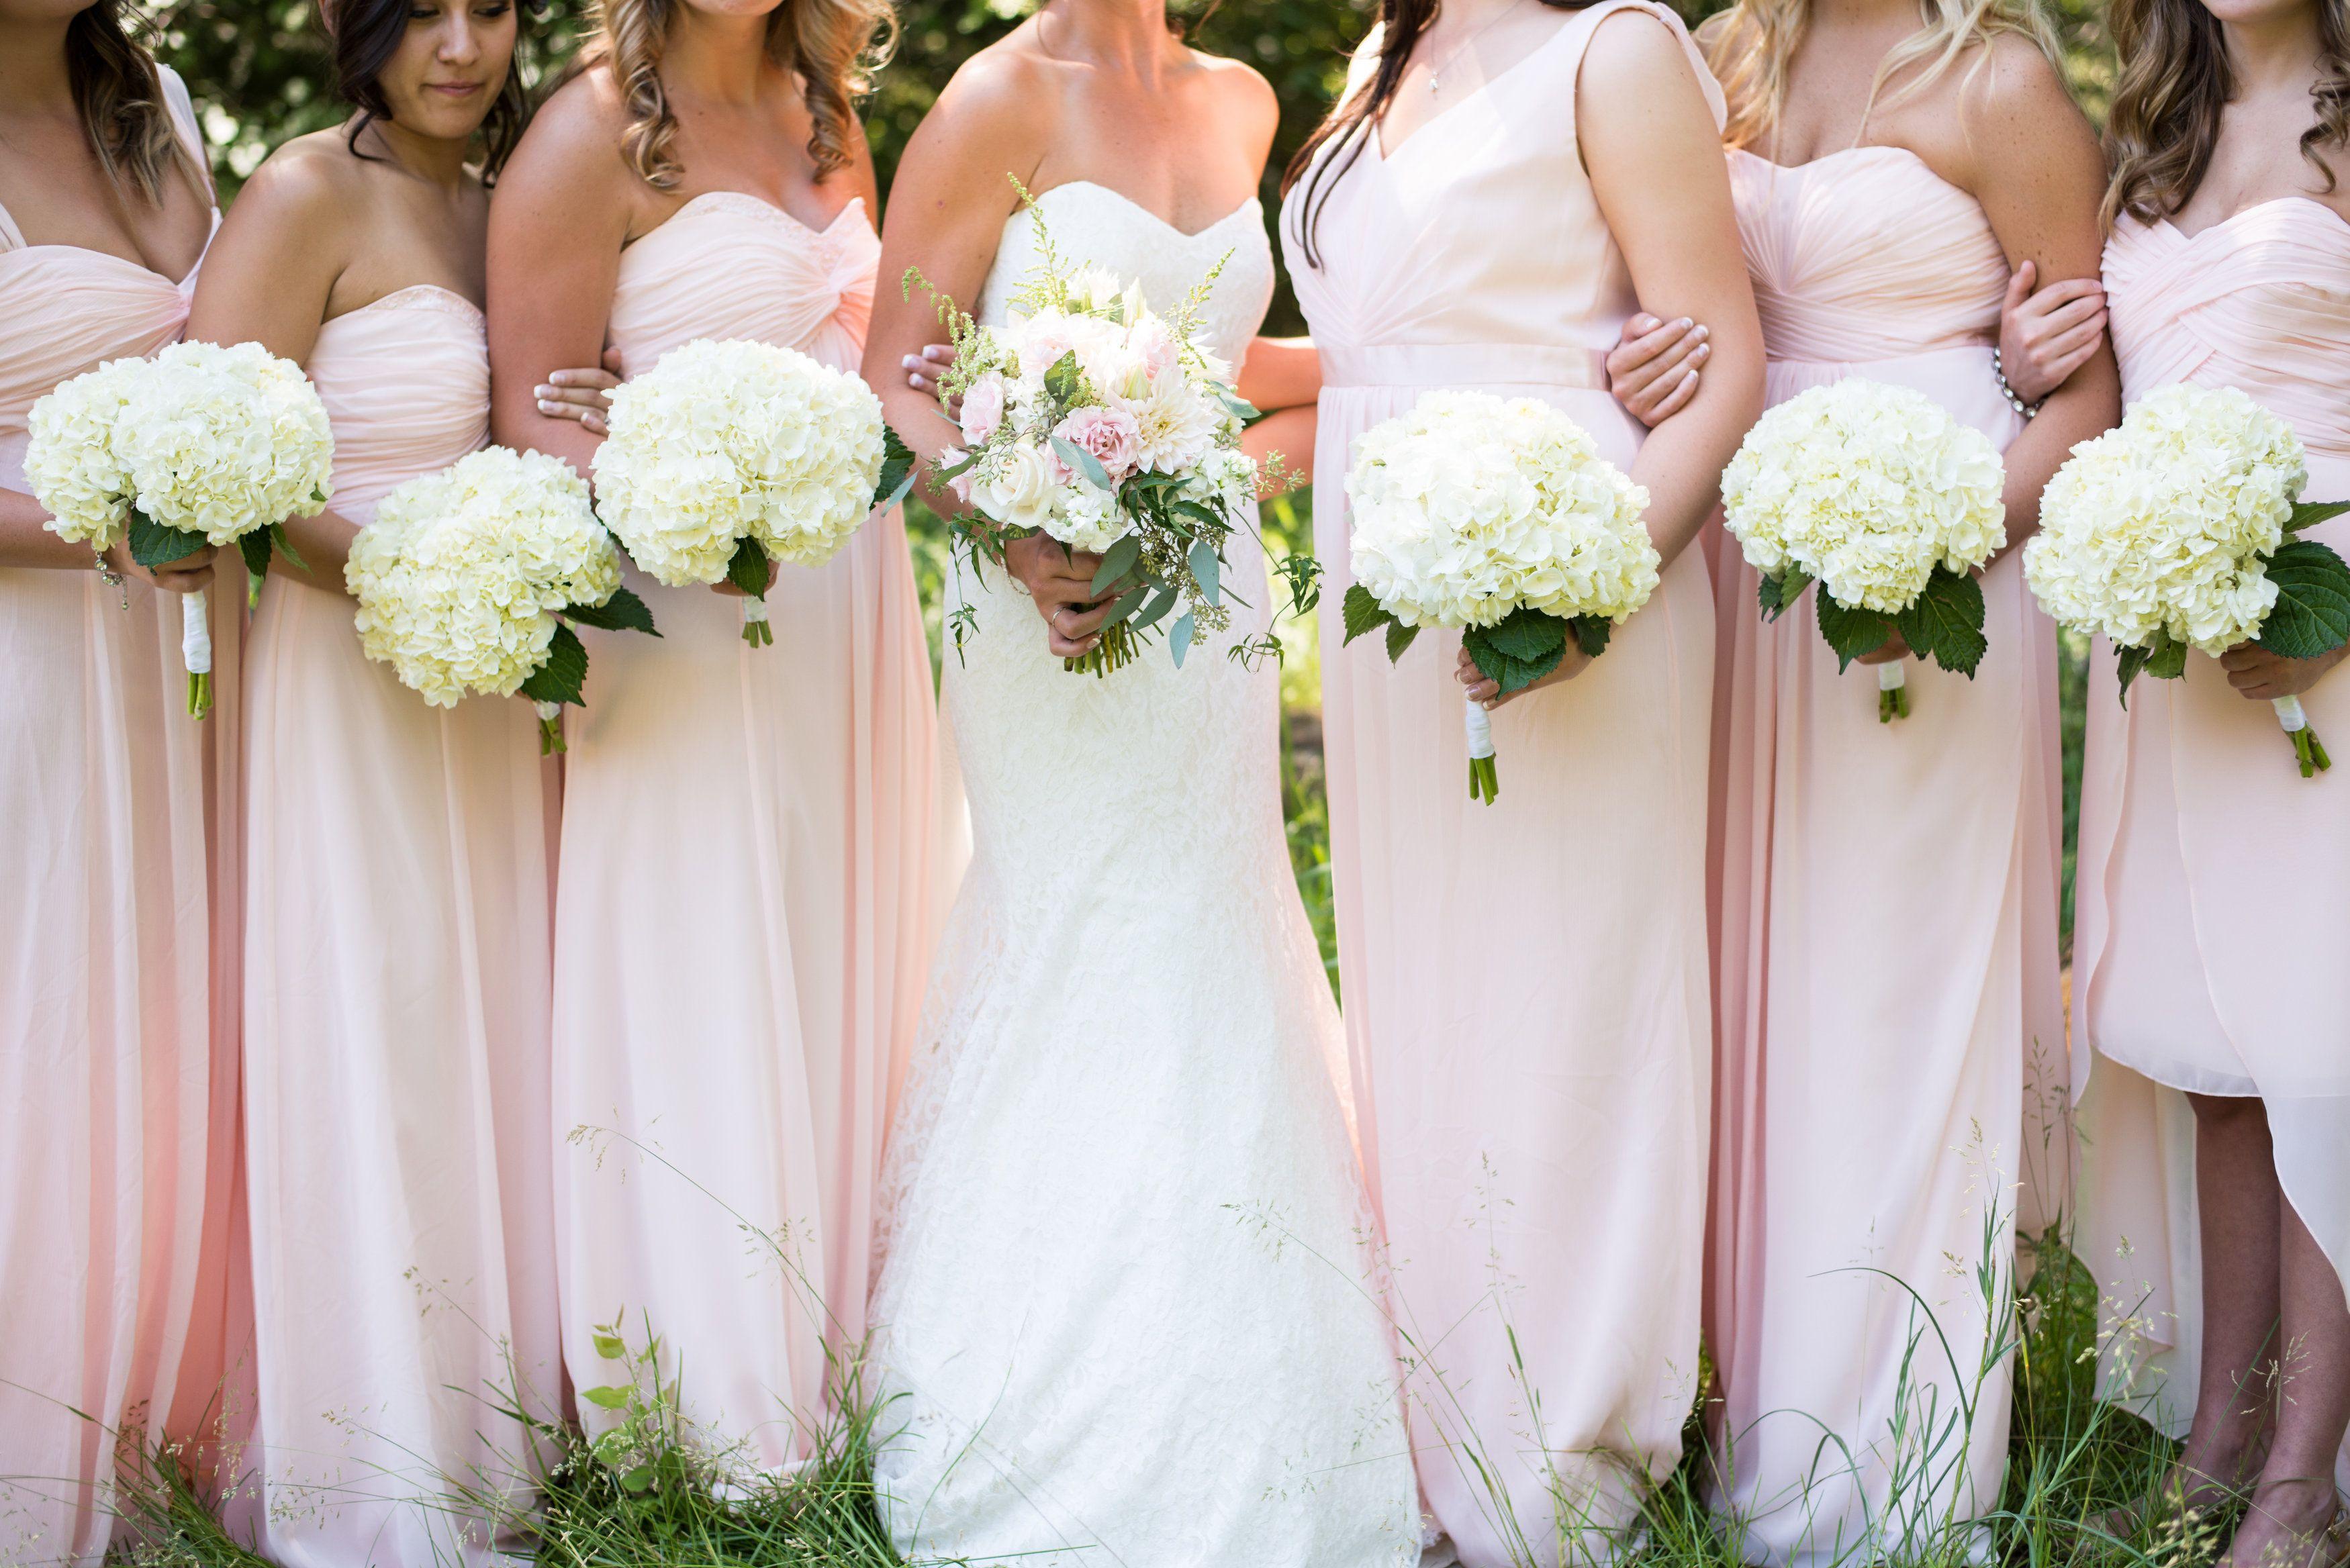 Simple White Hydrangea Bridesmaid's Bouquets | Mum's Flowers: Whitefish, Montana